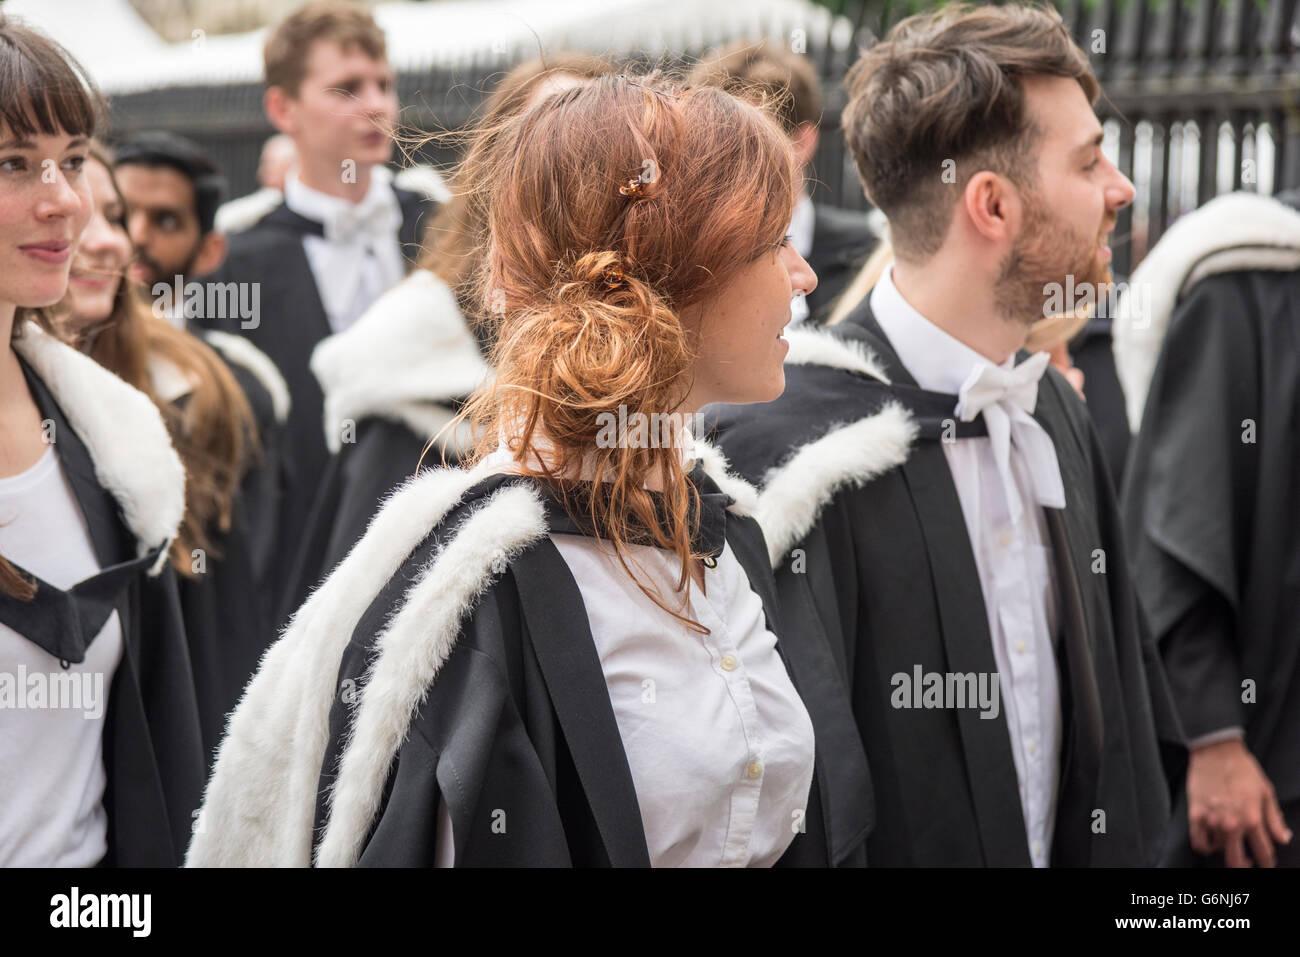 Cambridge University students taking part in a graduation ceremony Cambridge UK - Stock Image